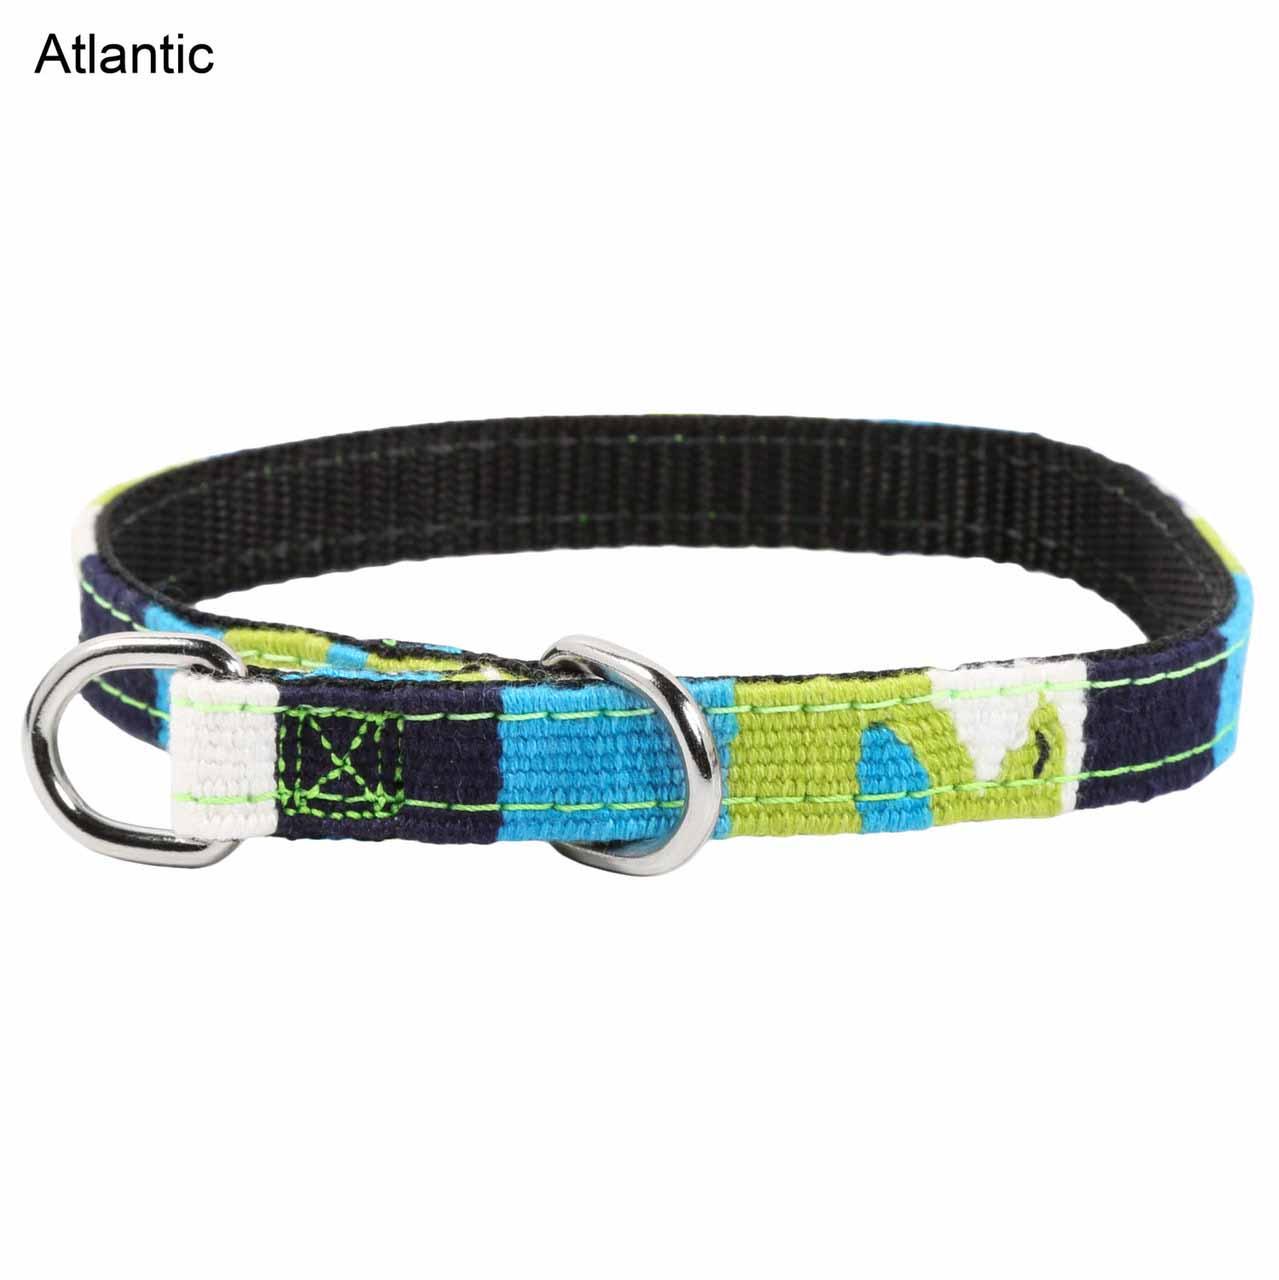 MAYA Small Slip Collar for Puppies & Small Dogs - Atlantic